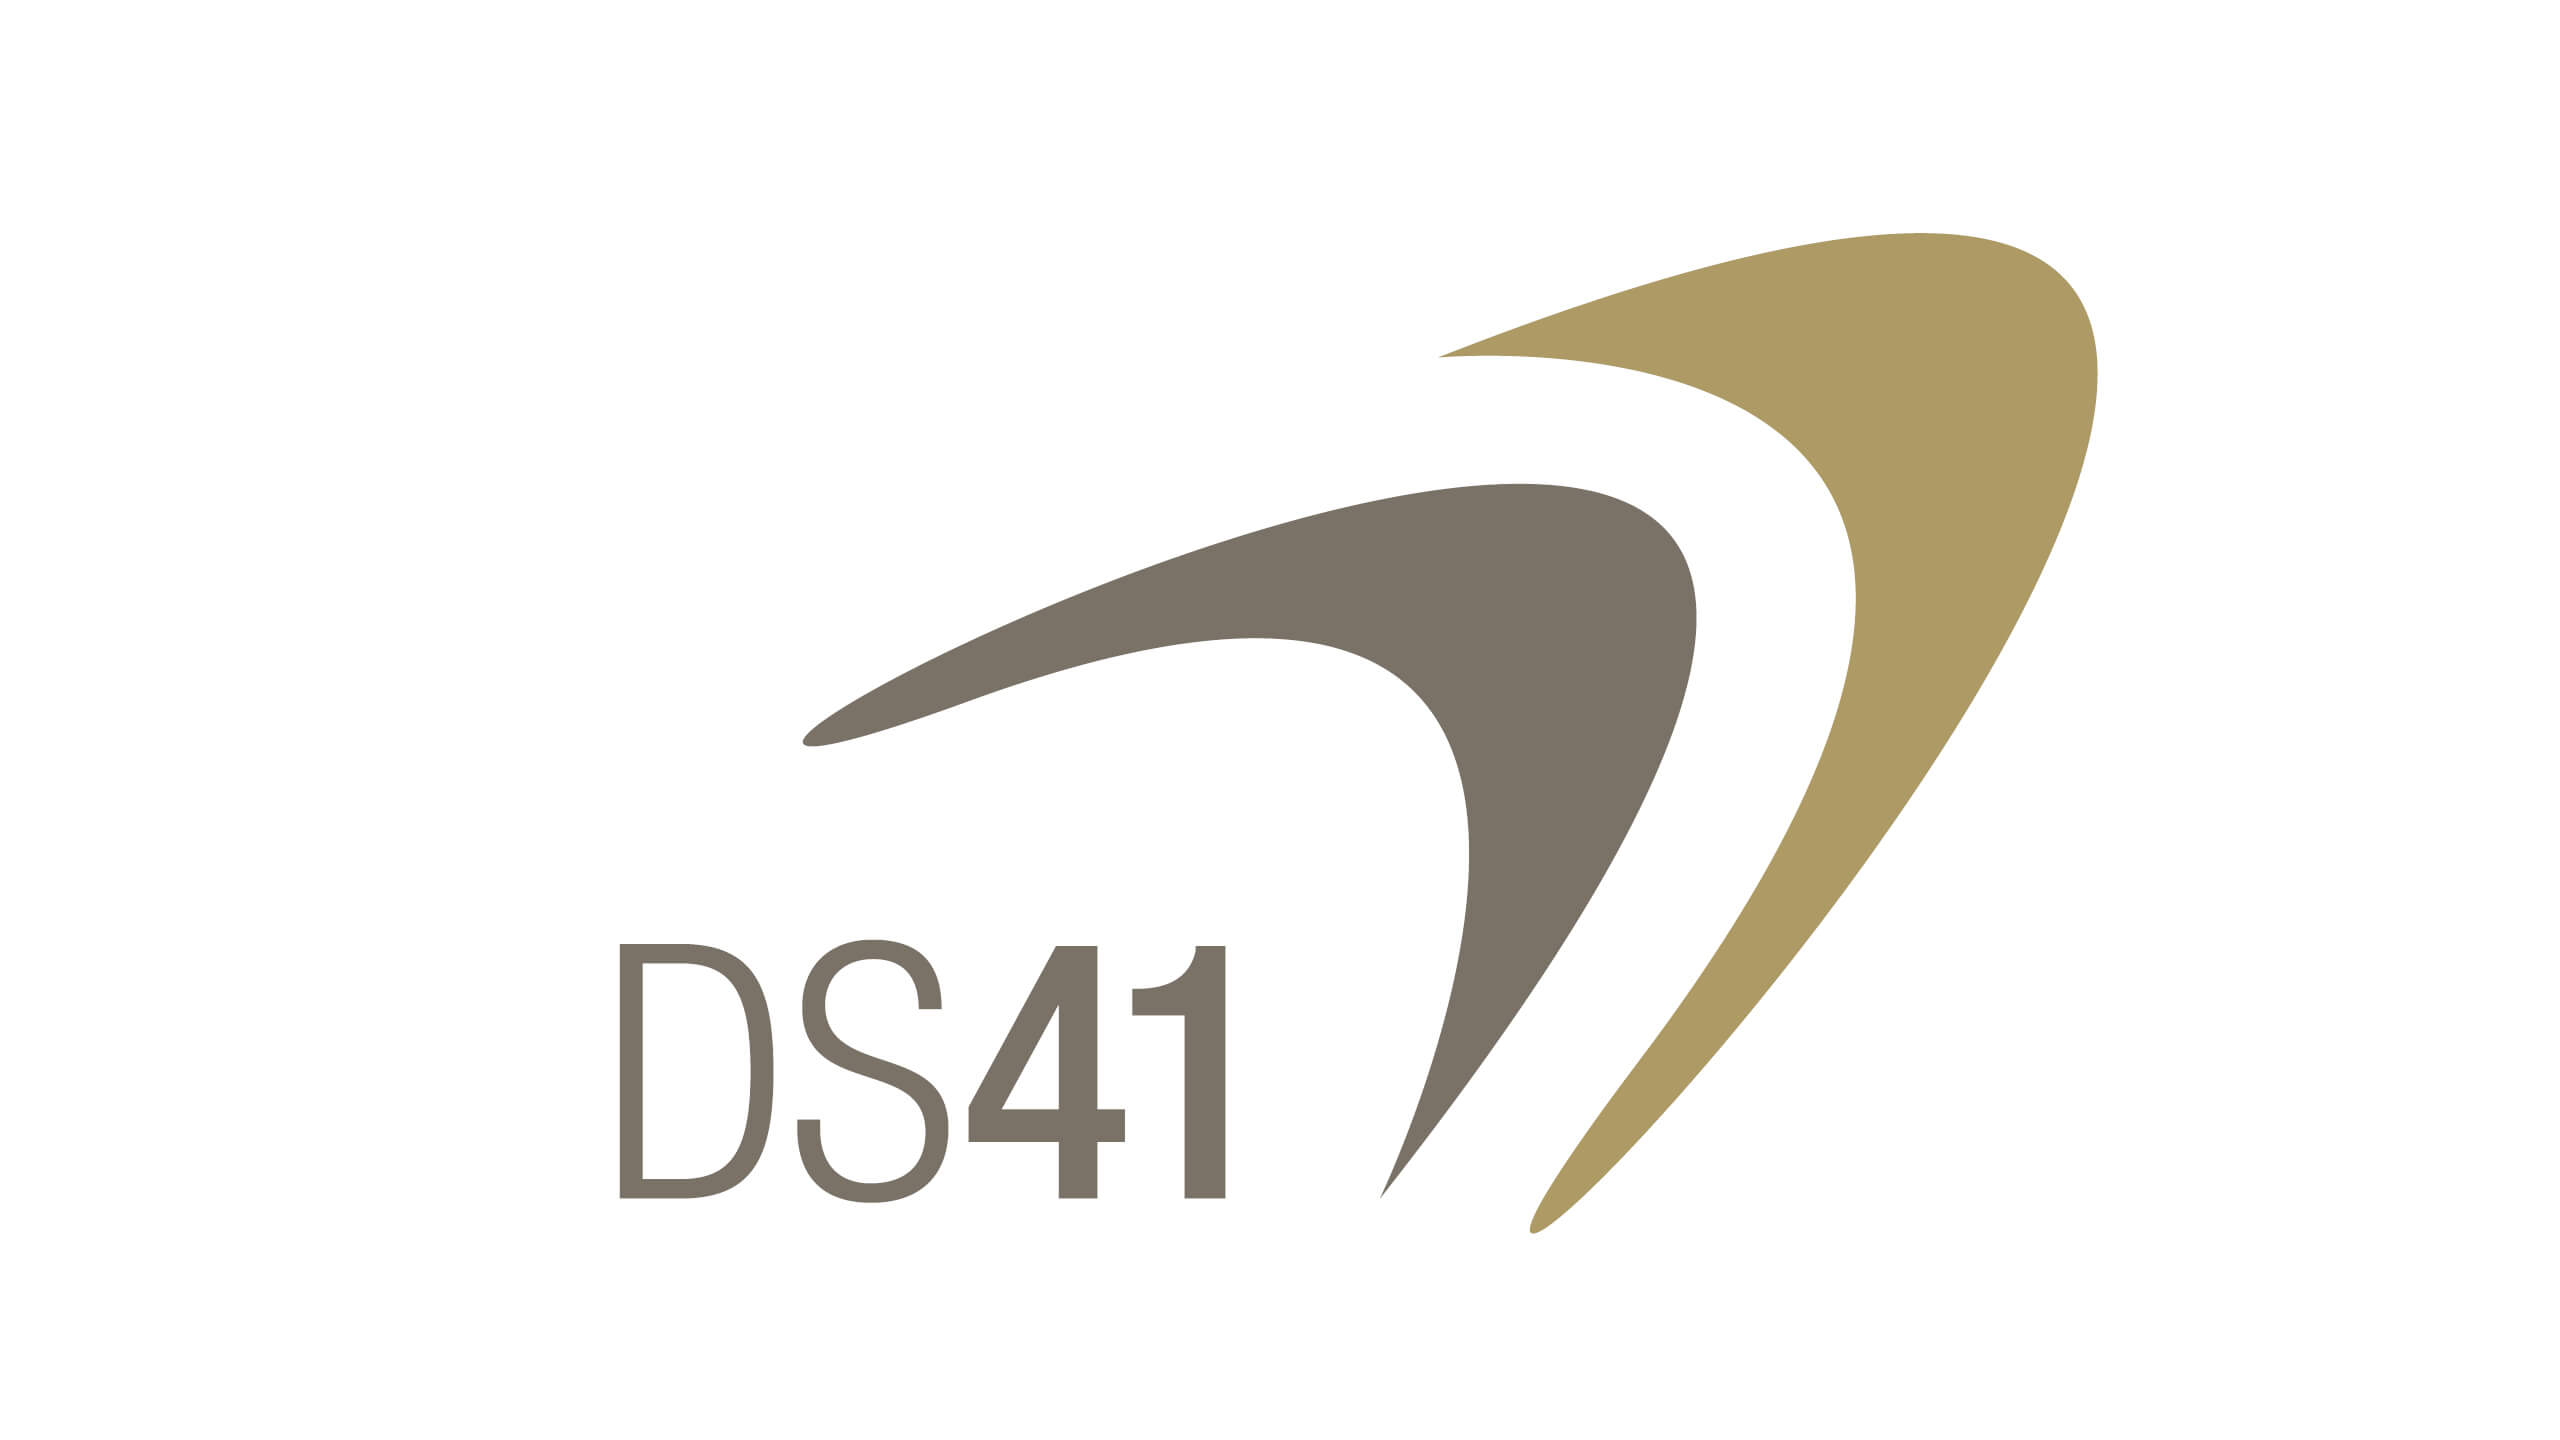 Moody_DS41_Packages.jpg